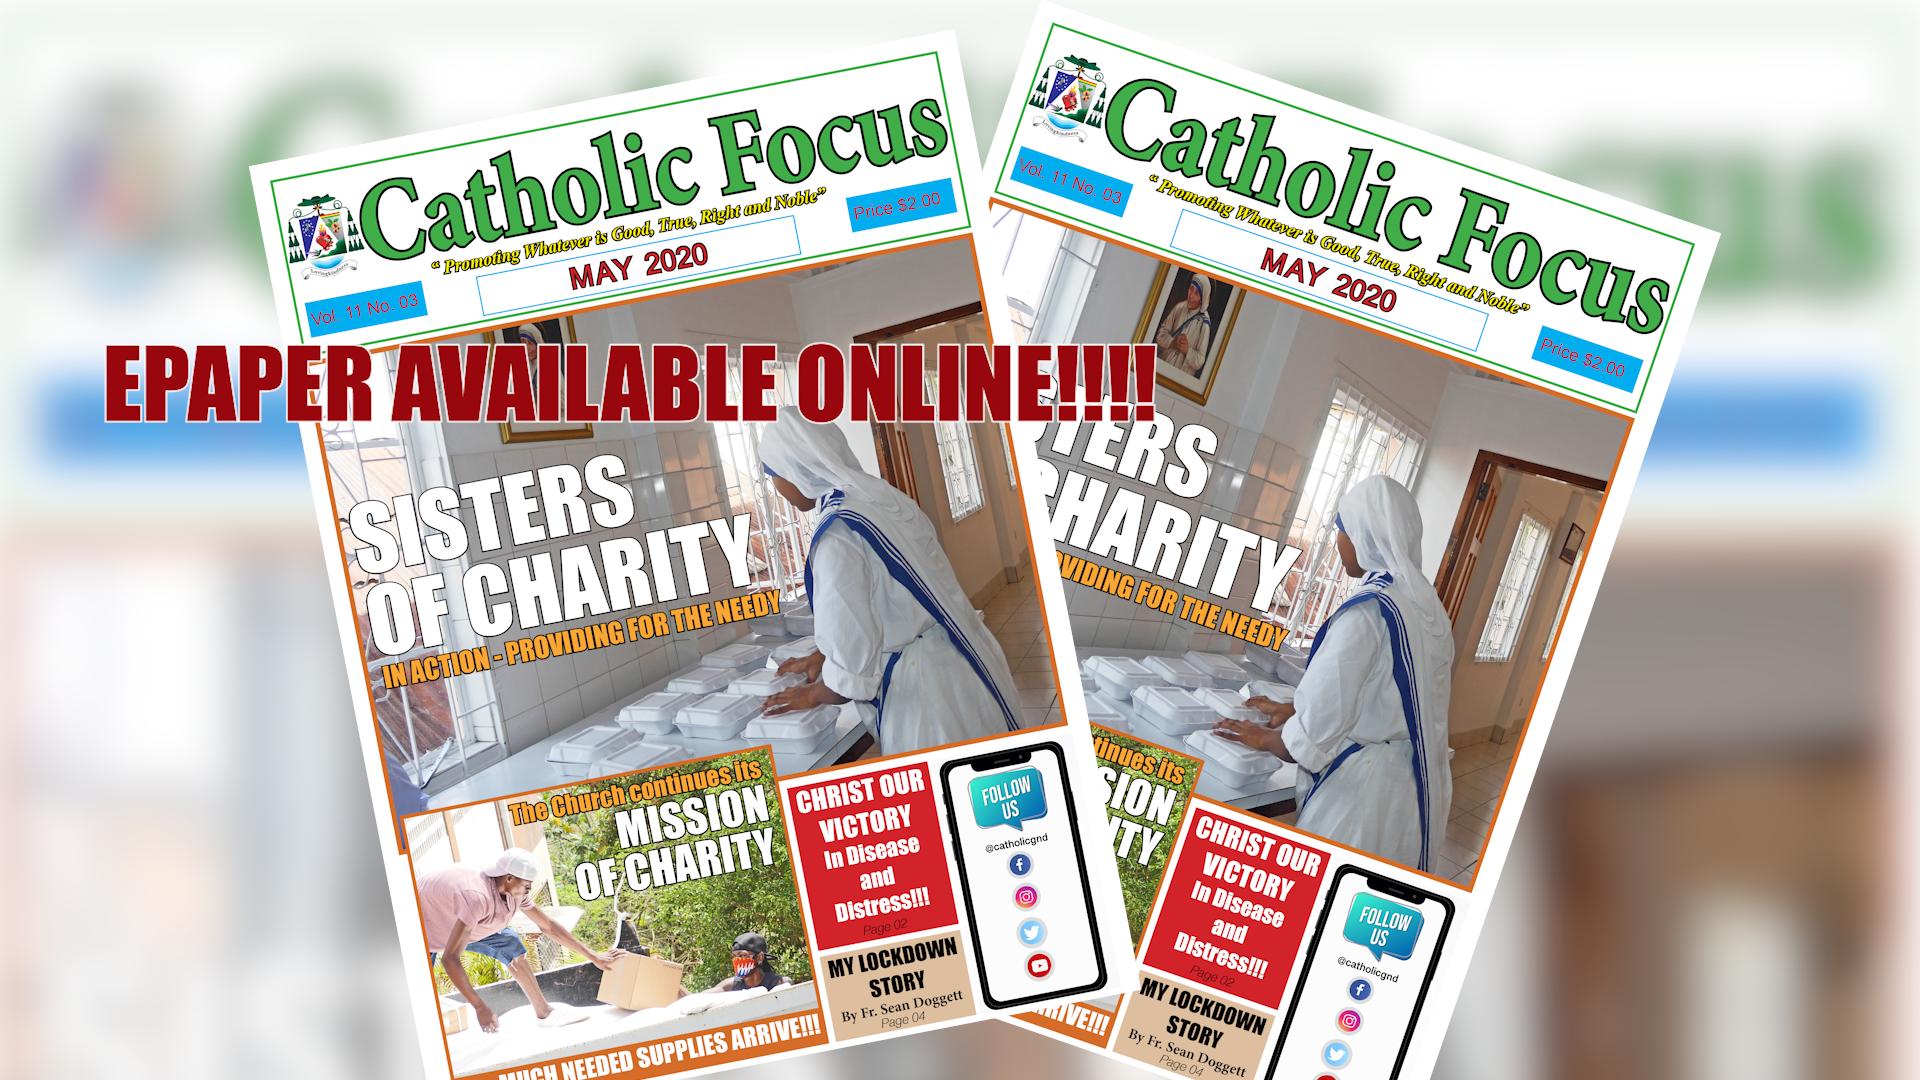 Catholic Focus May 2020 Issue